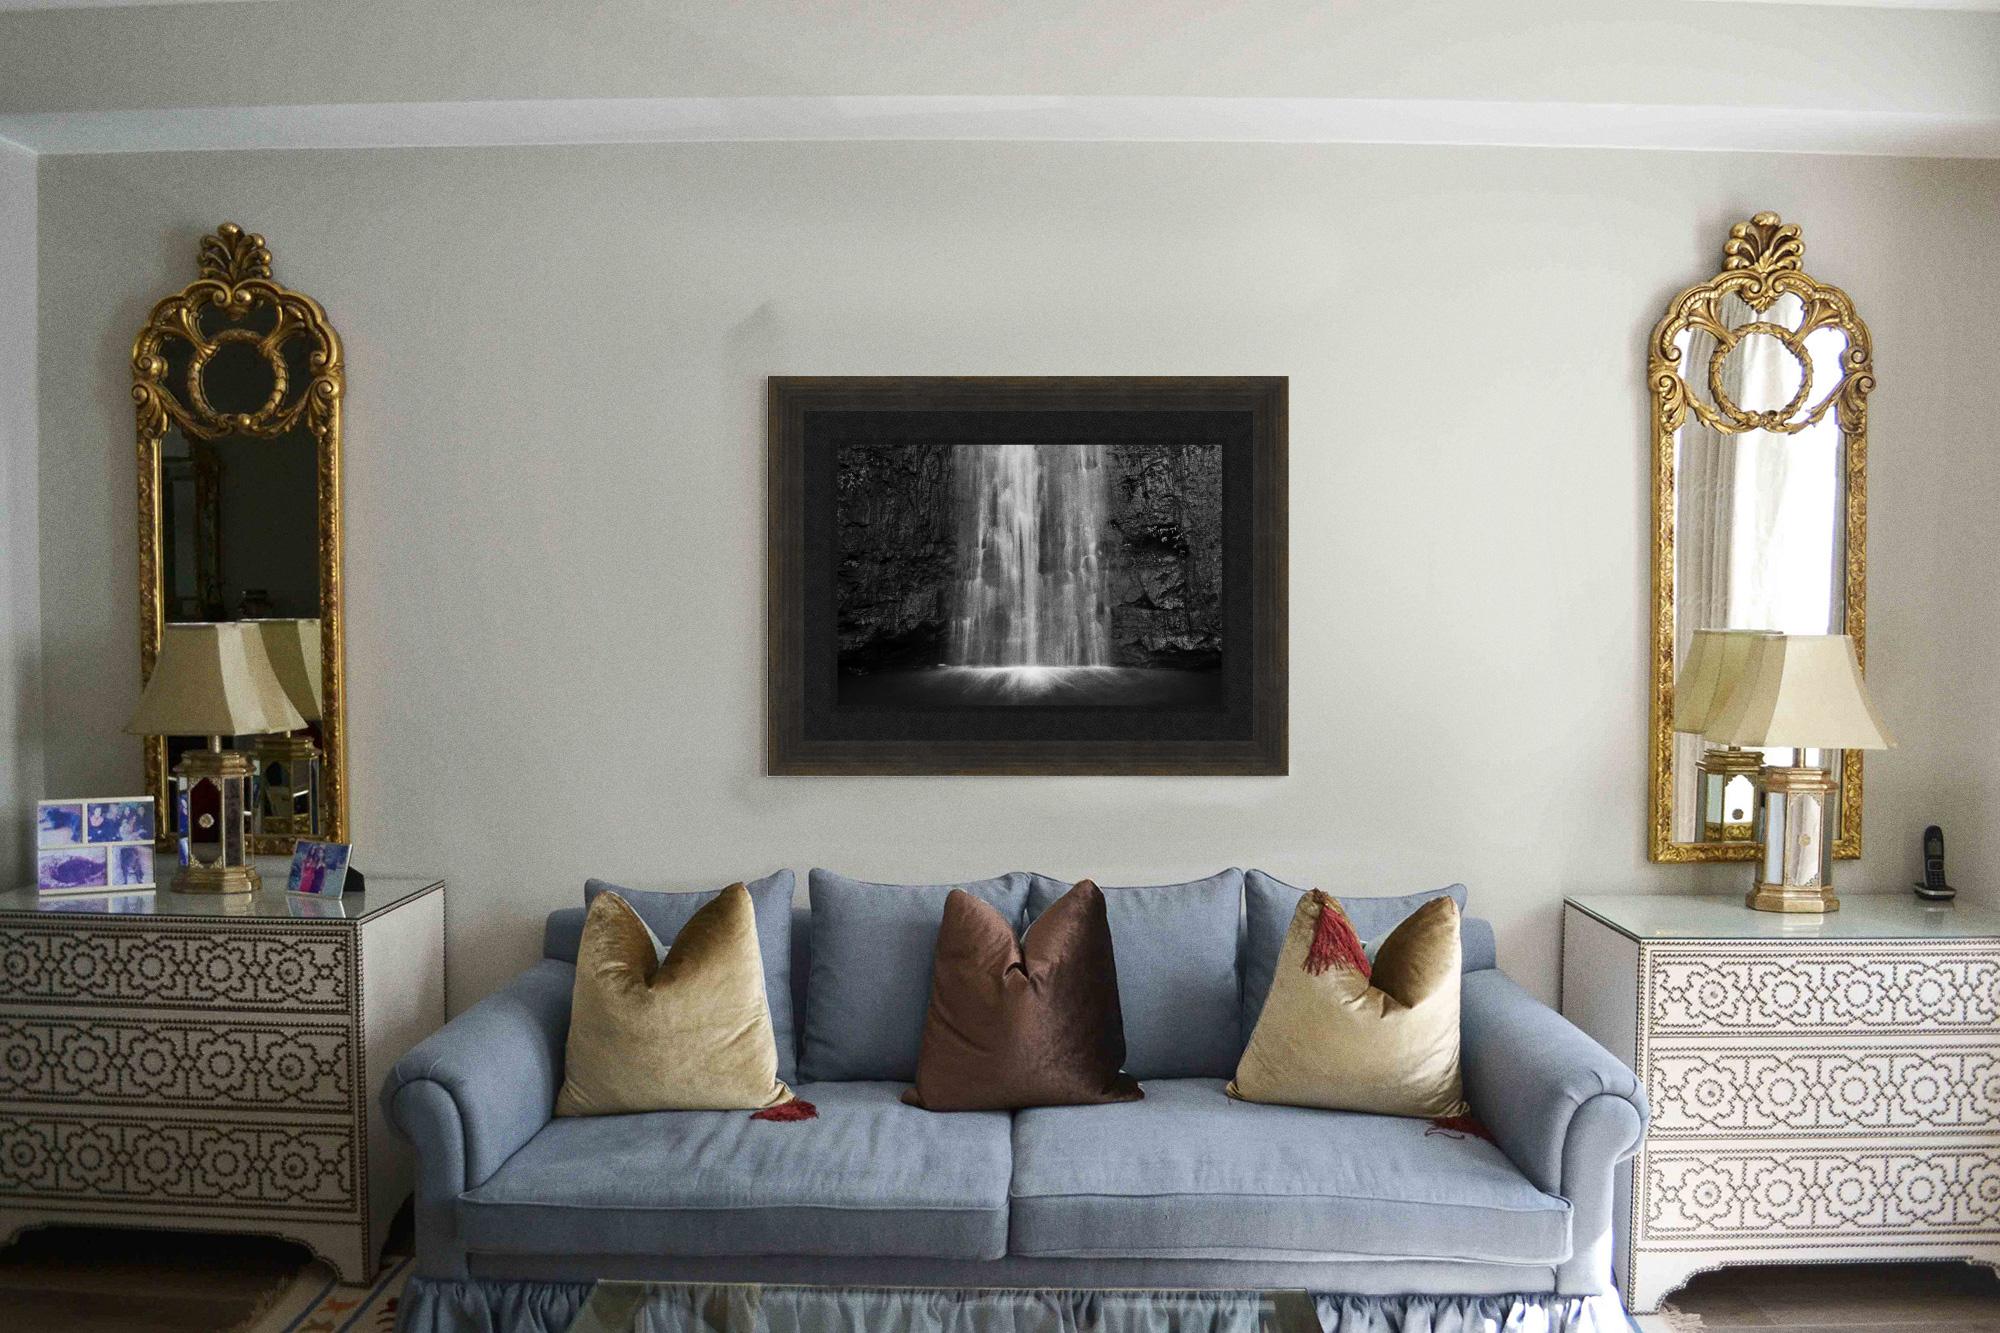 Manoa-Falls-in-home-I.jpg